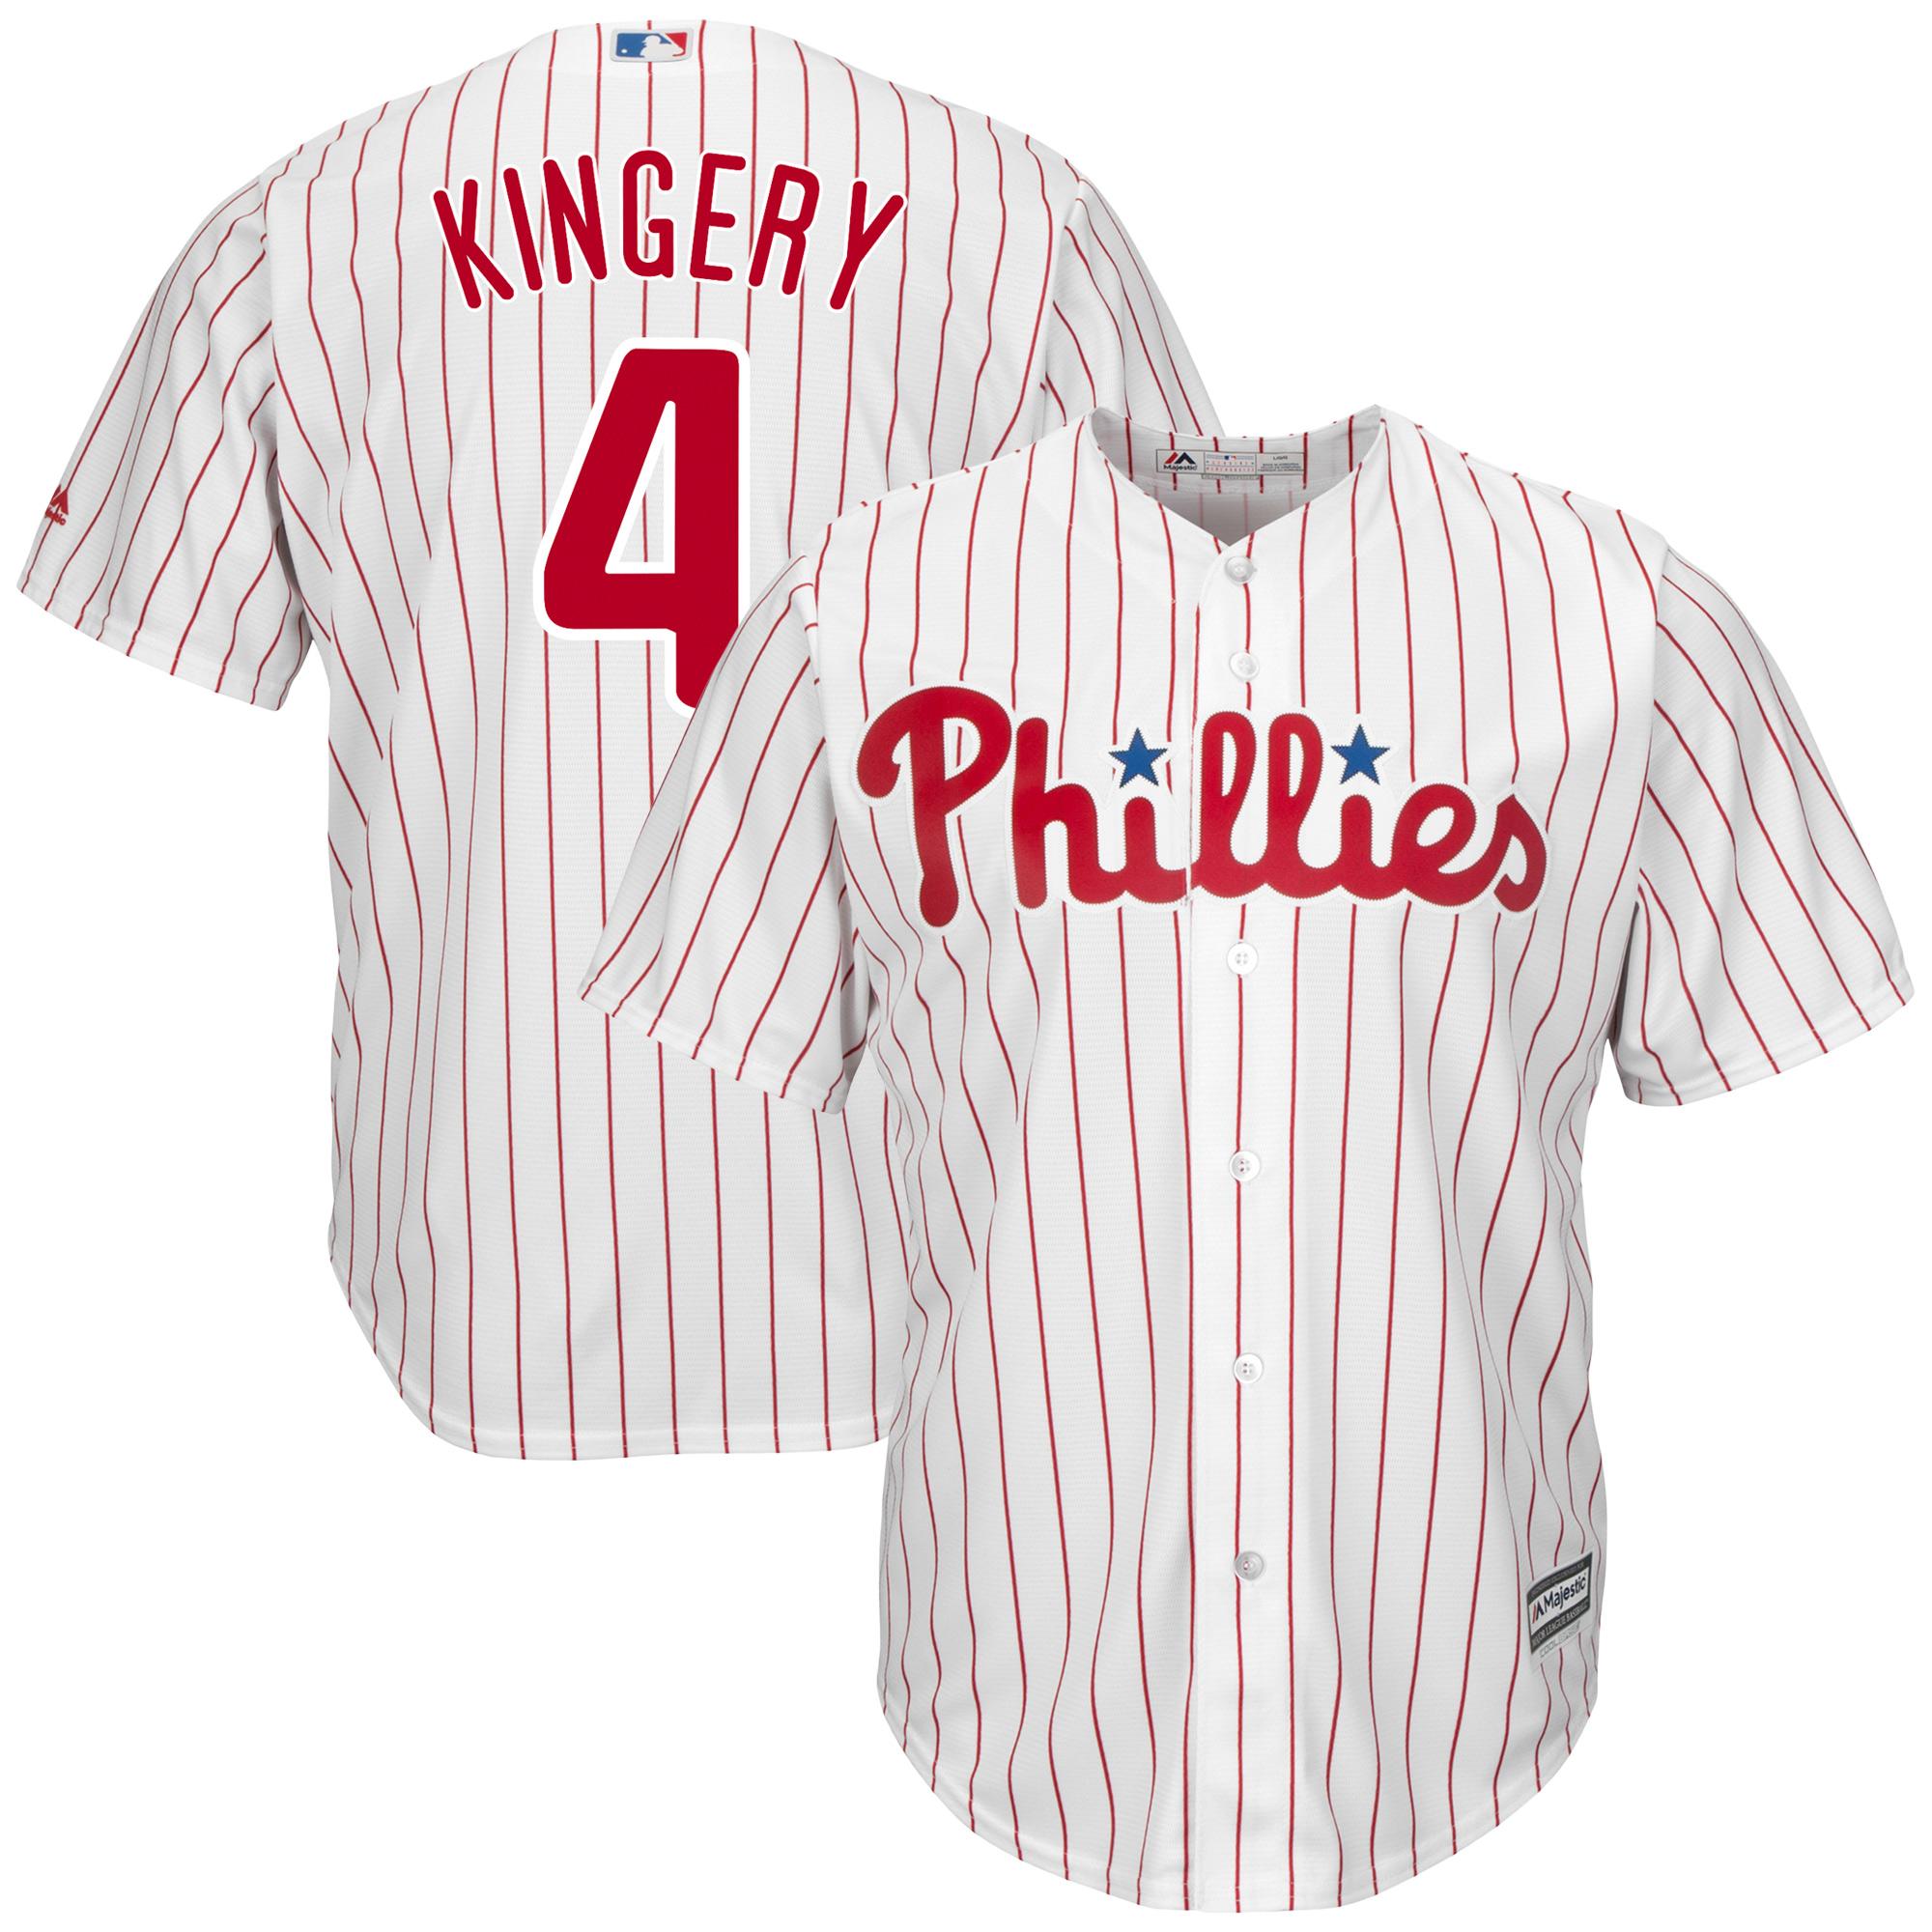 Scott Kingery Philadelphia Phillies Majestic Official Cool Base Player Jersey - White